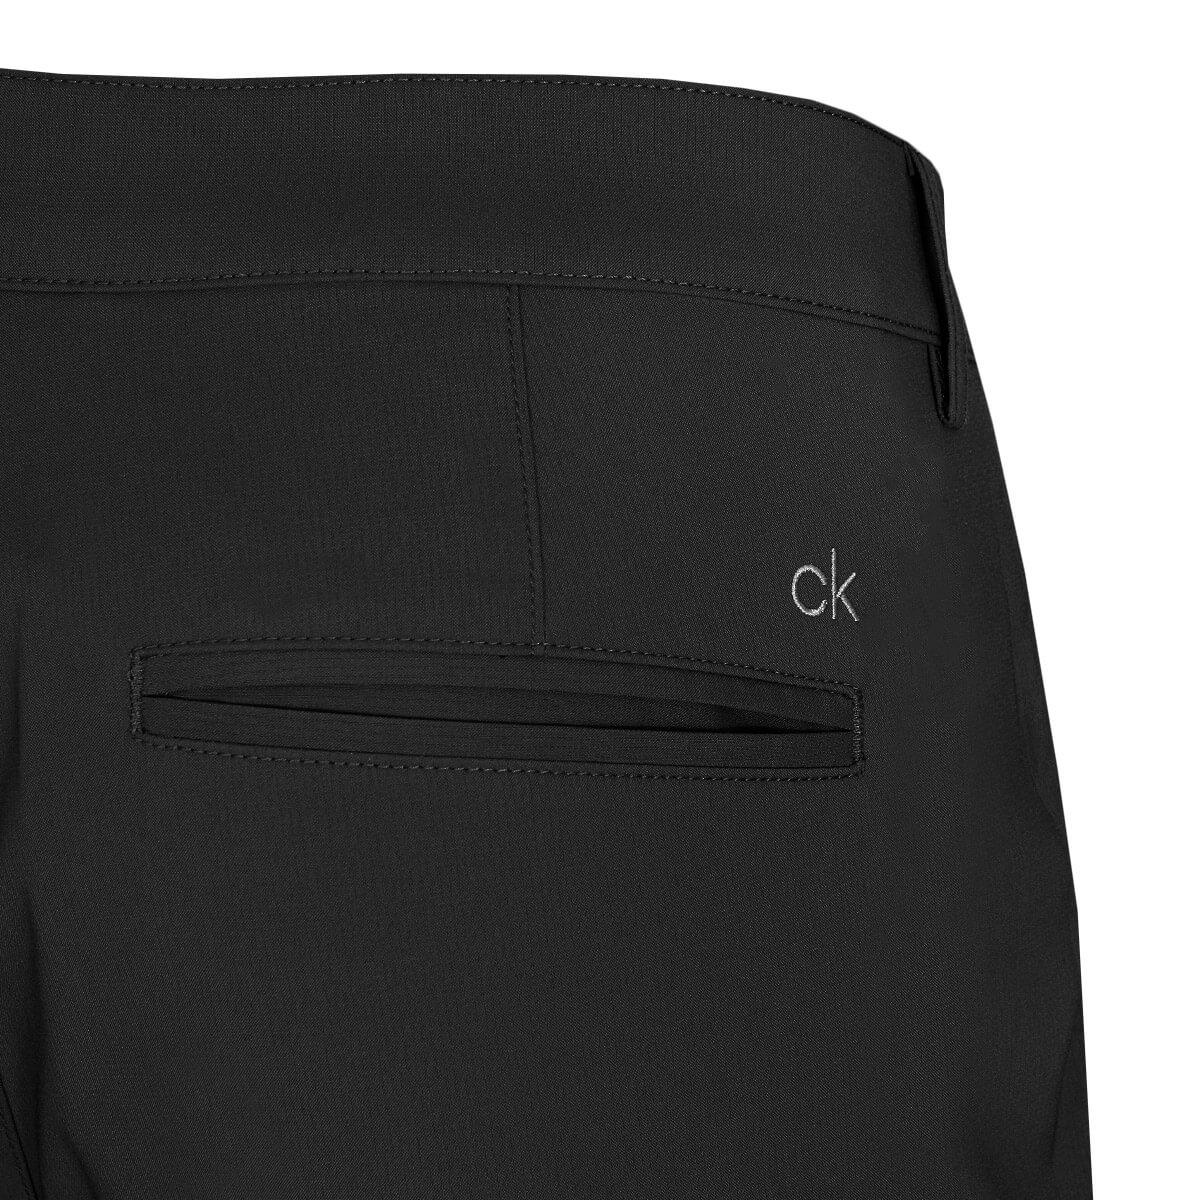 thumbnail 4 - Calvin Klein Mens 2021 Slim Fit Micro Tech Lightweight Golf Shorts 34% OFF RRP